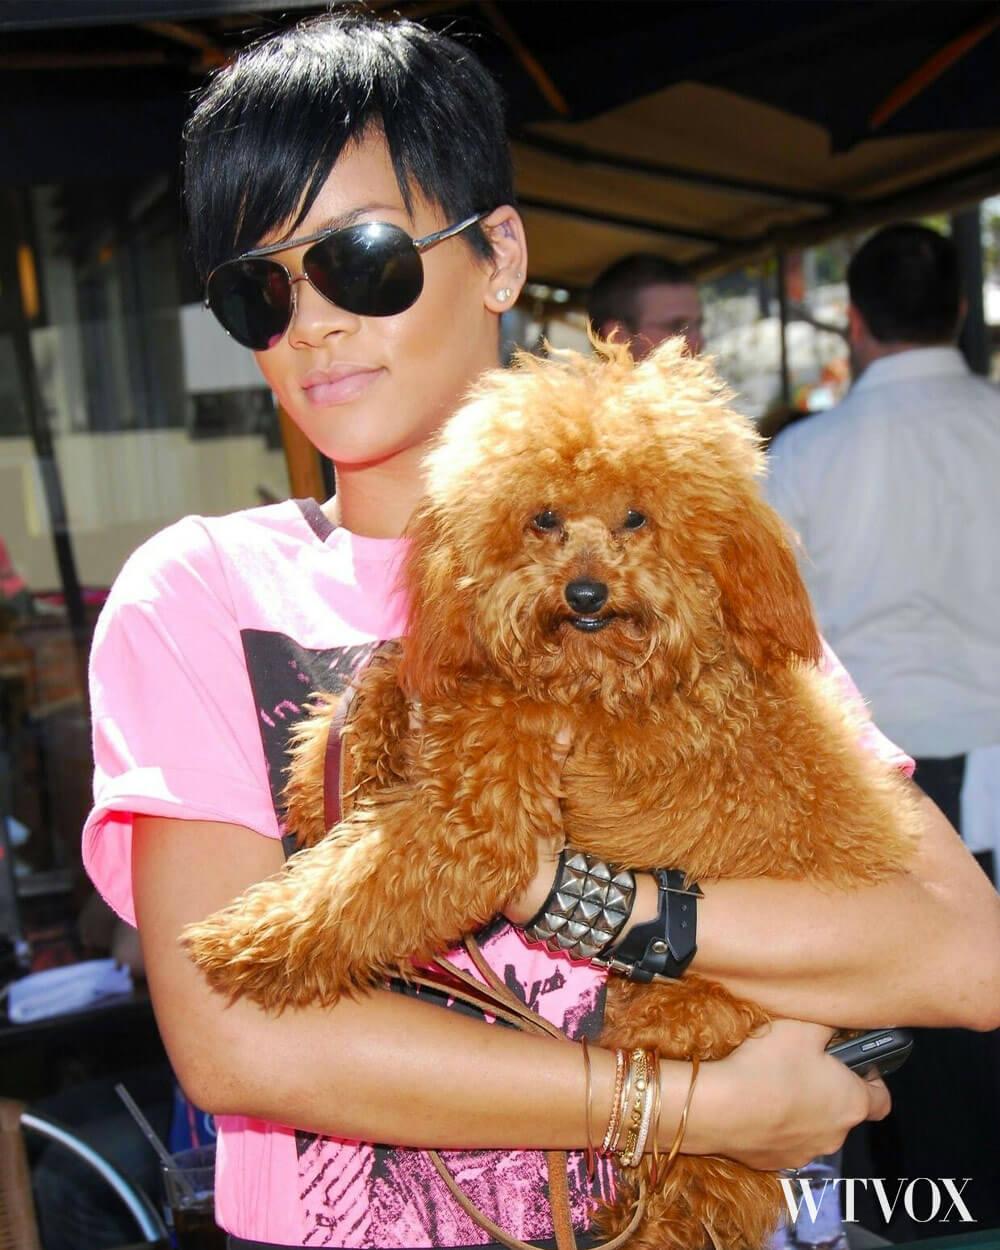 Rihanna with her poppy dog, Oliver